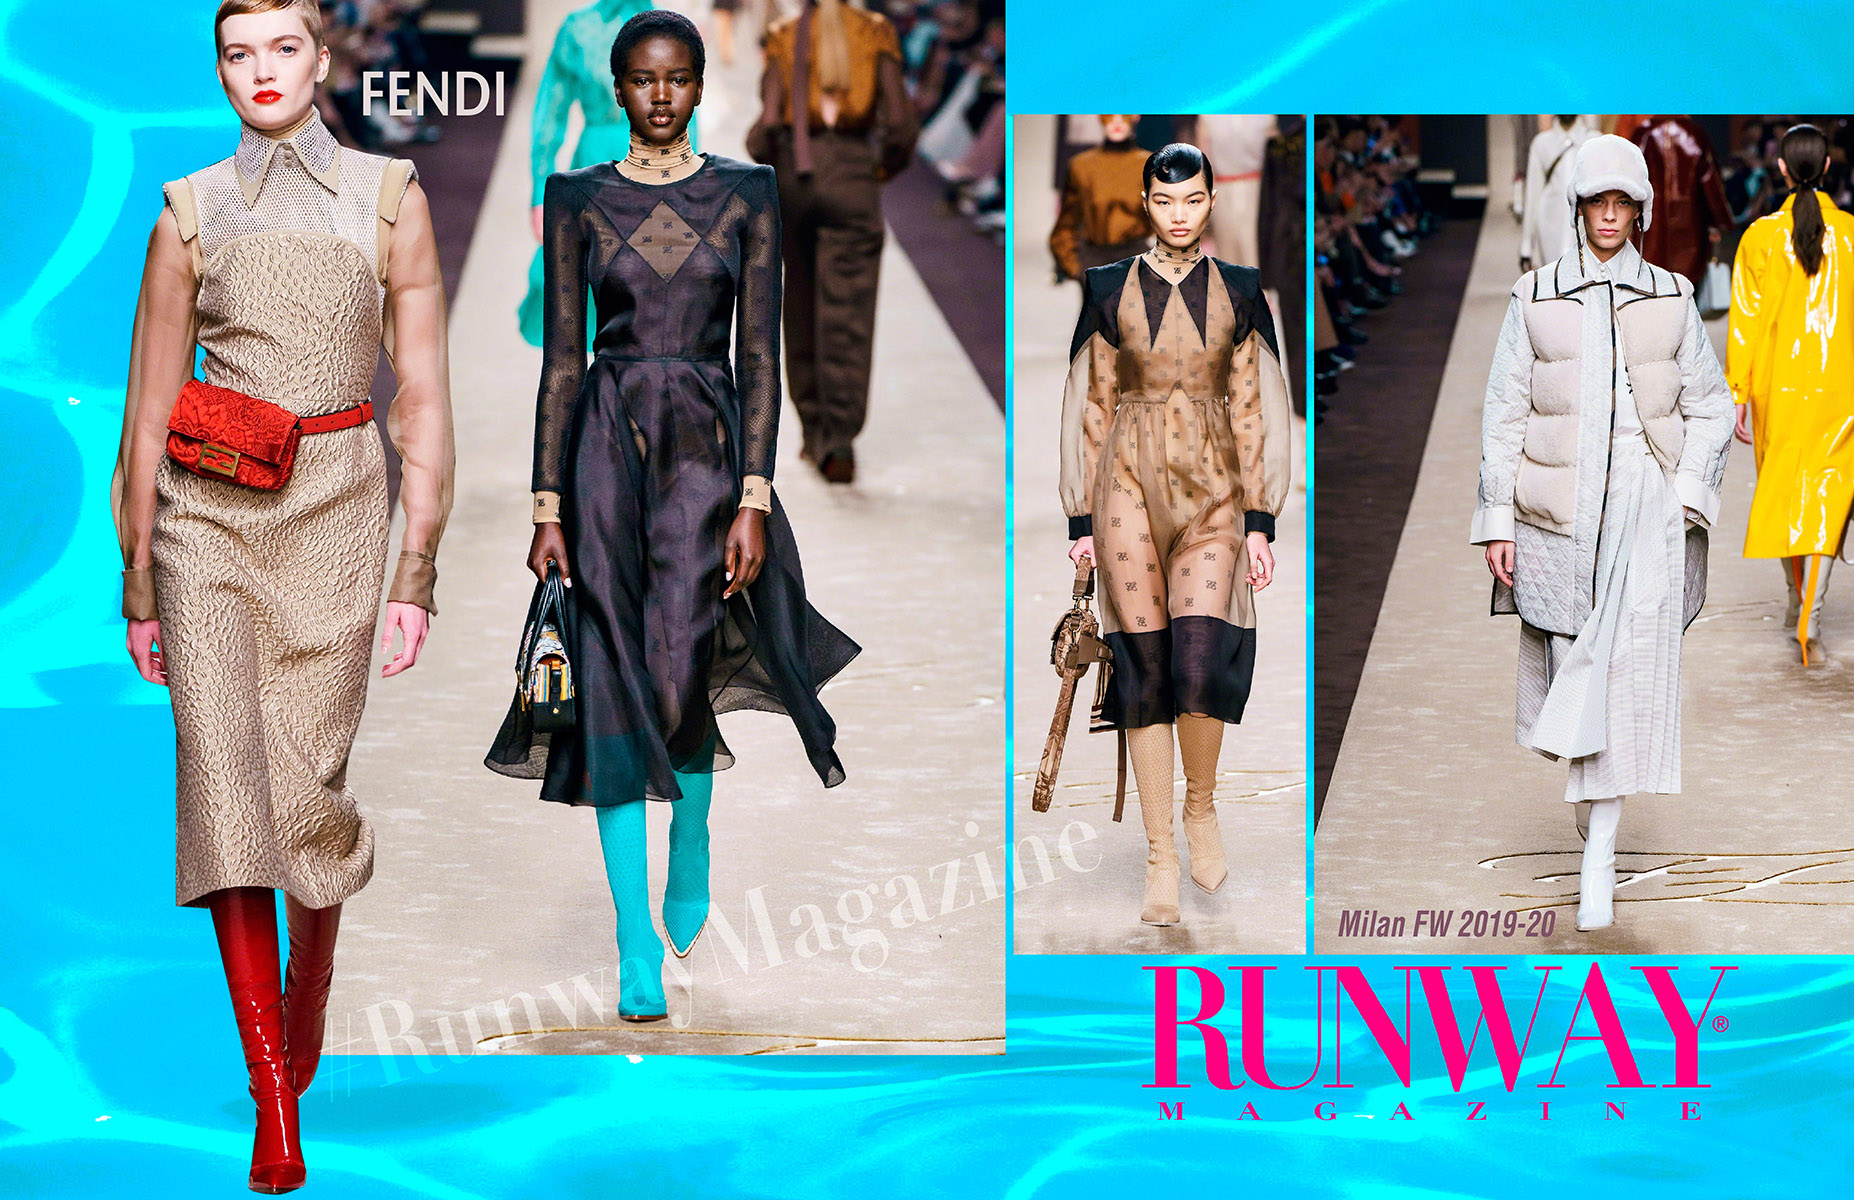 Fendi Fall Winter 2019-2020 Milan - last collection of Karl Lagerfeld